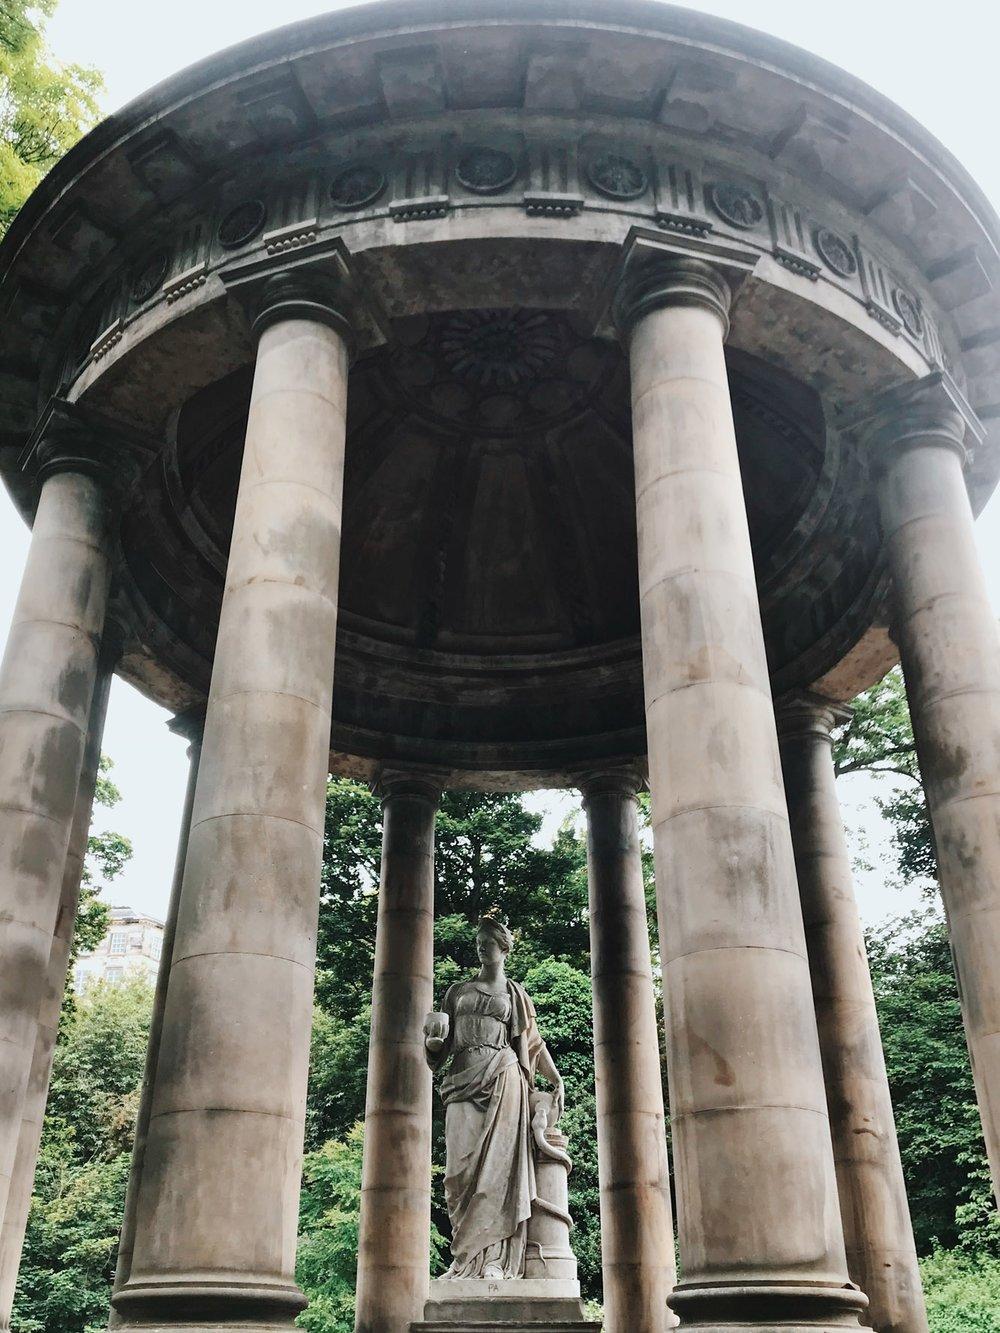 Hygia presides over St Bernard's Well